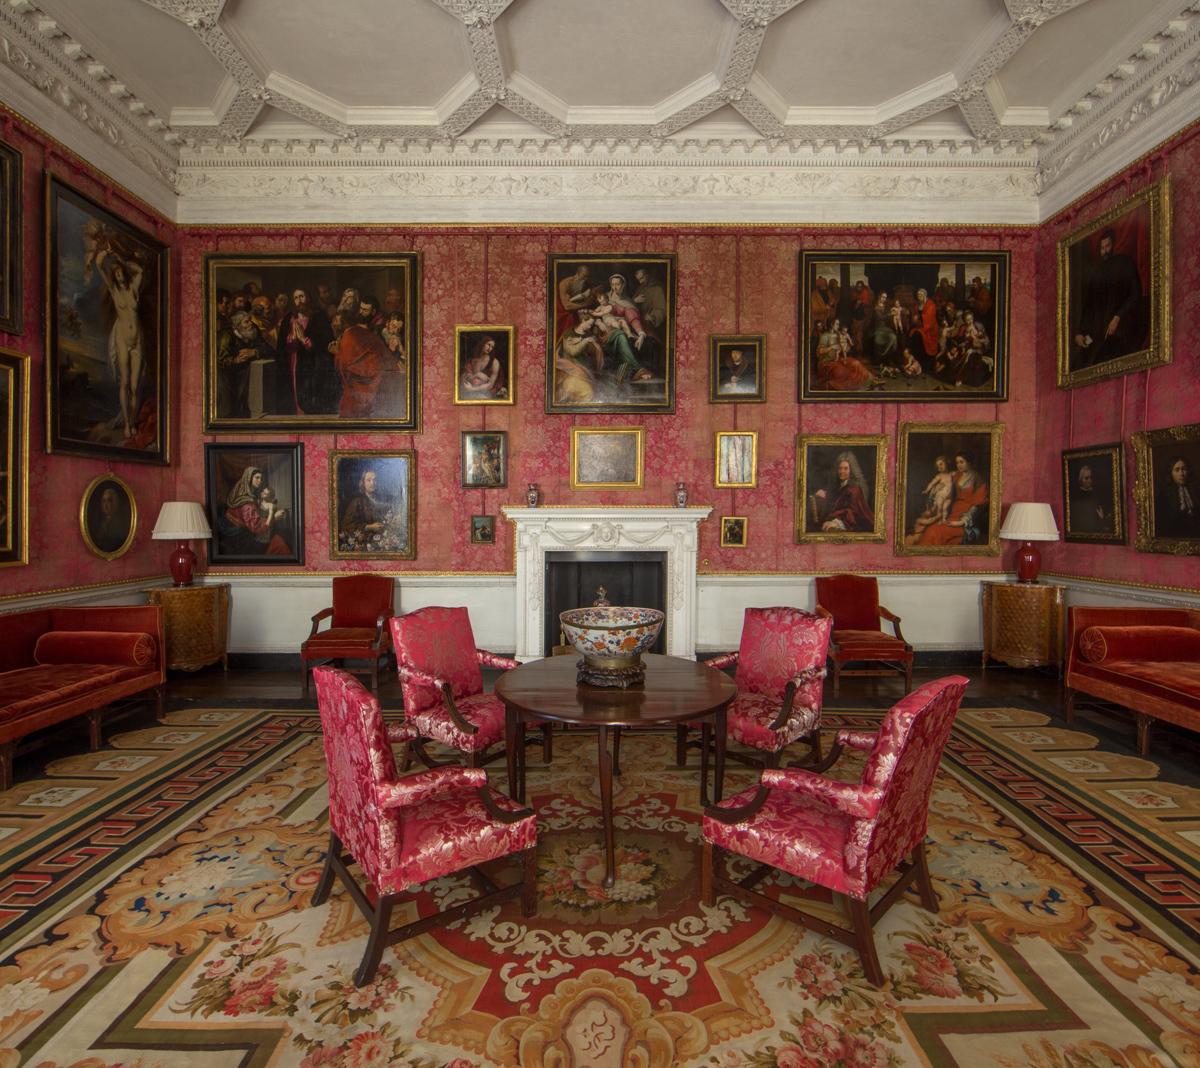 19072018_OWP001_Castletown_Red_Room_003_HIGH_RESOLUTION.jpg#asset:13705